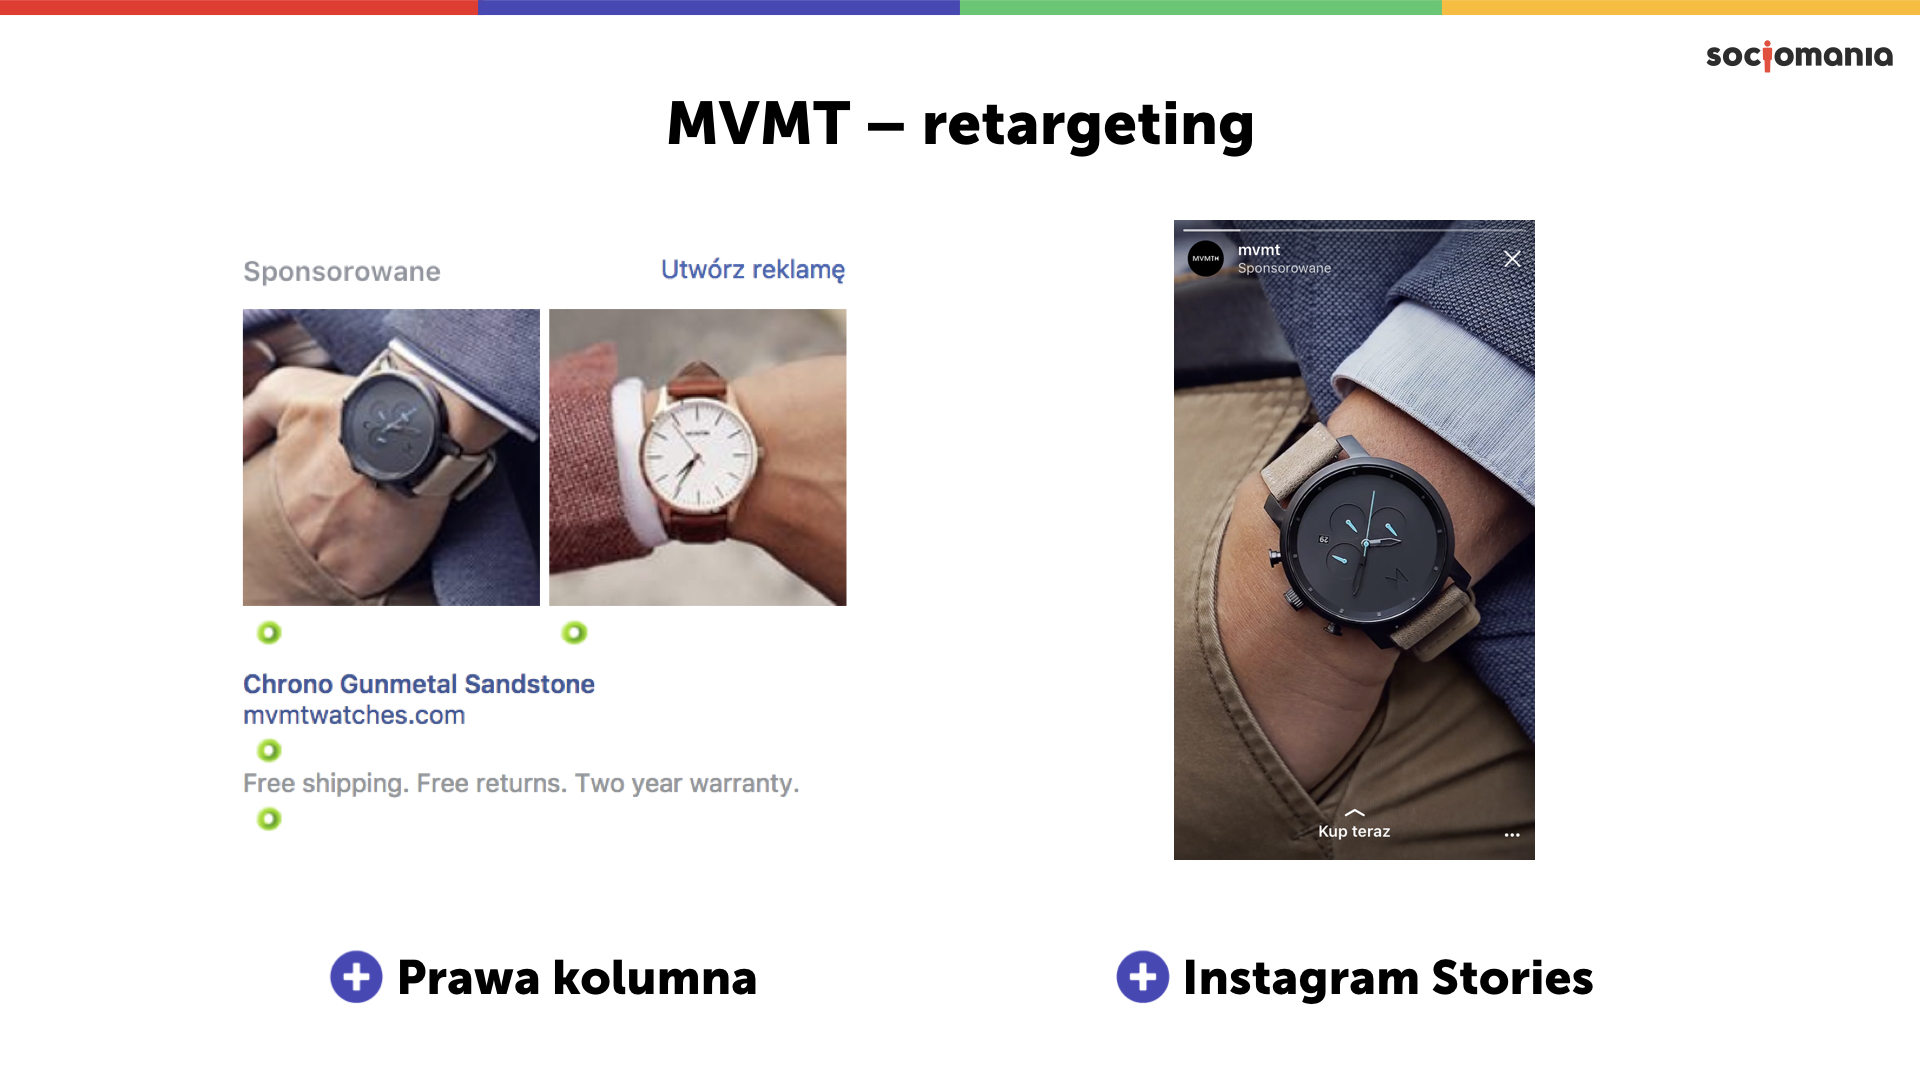 Rys. 7 Retargeting MVMT na Facebooku i Instagramie, źródło: Facebook, Instagram